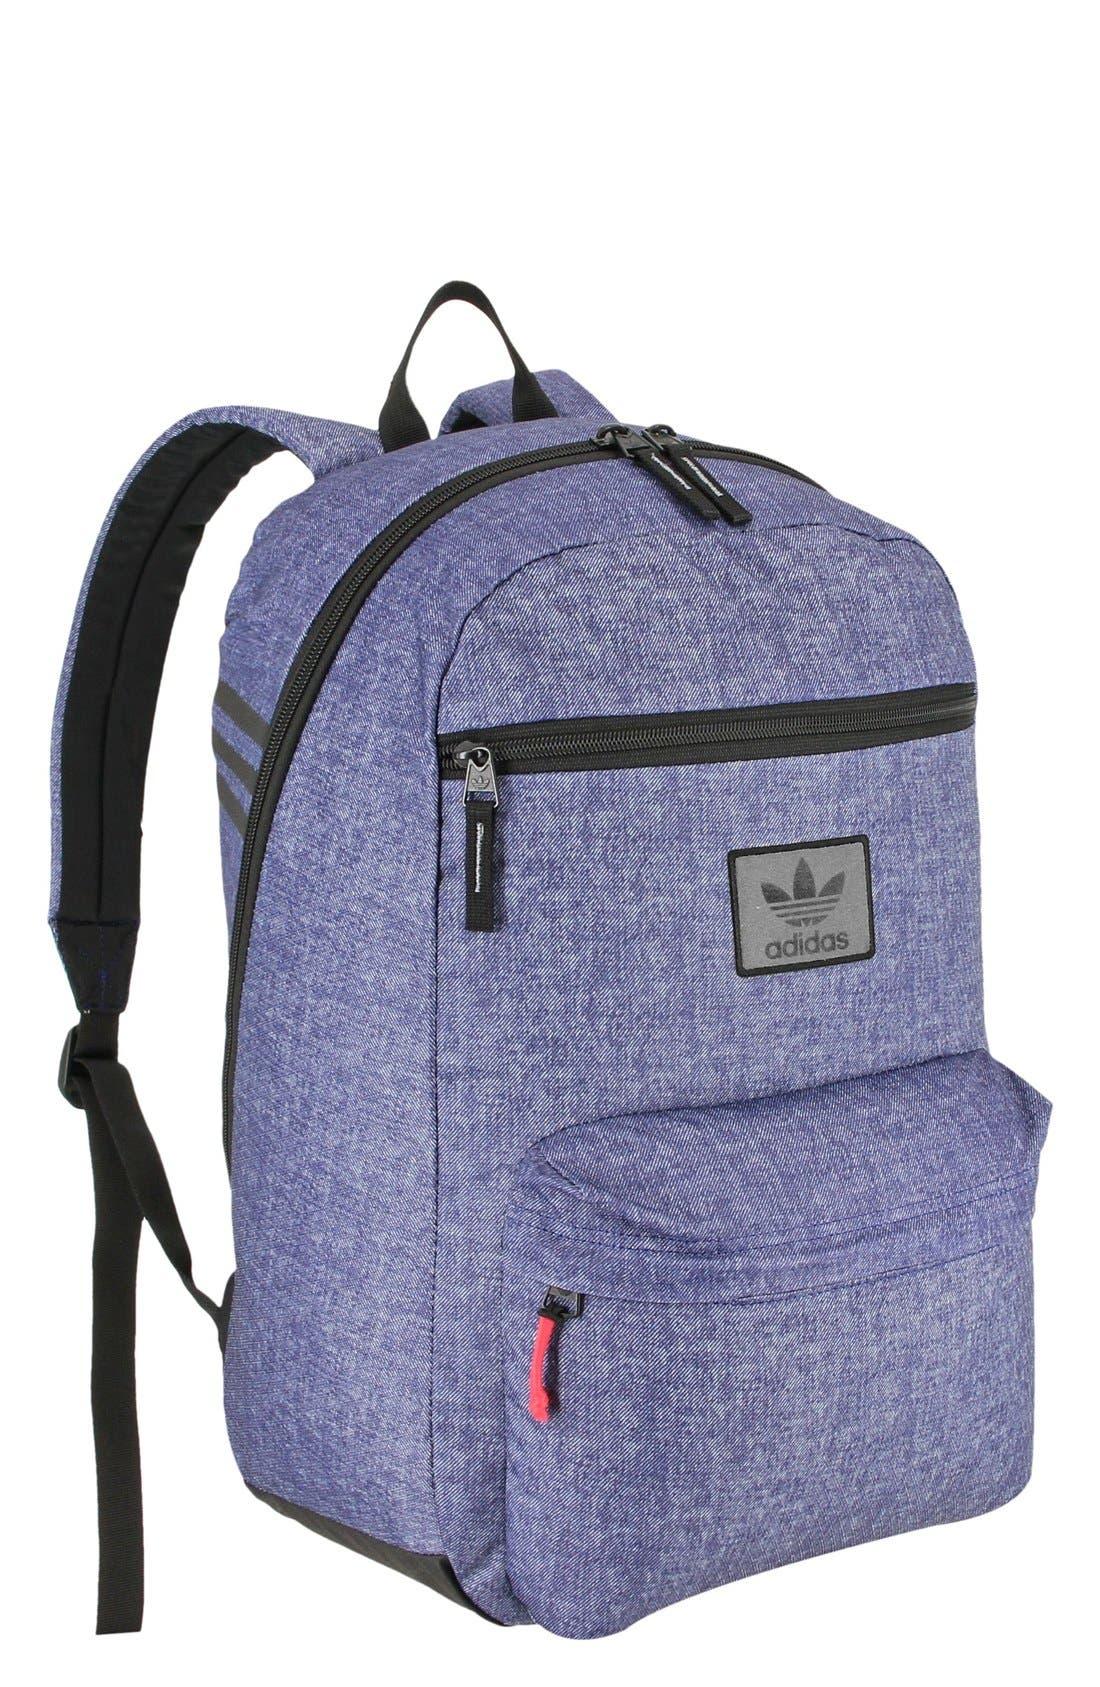 Alternate Image 1 Selected - adidas Originals 'National' Backpack